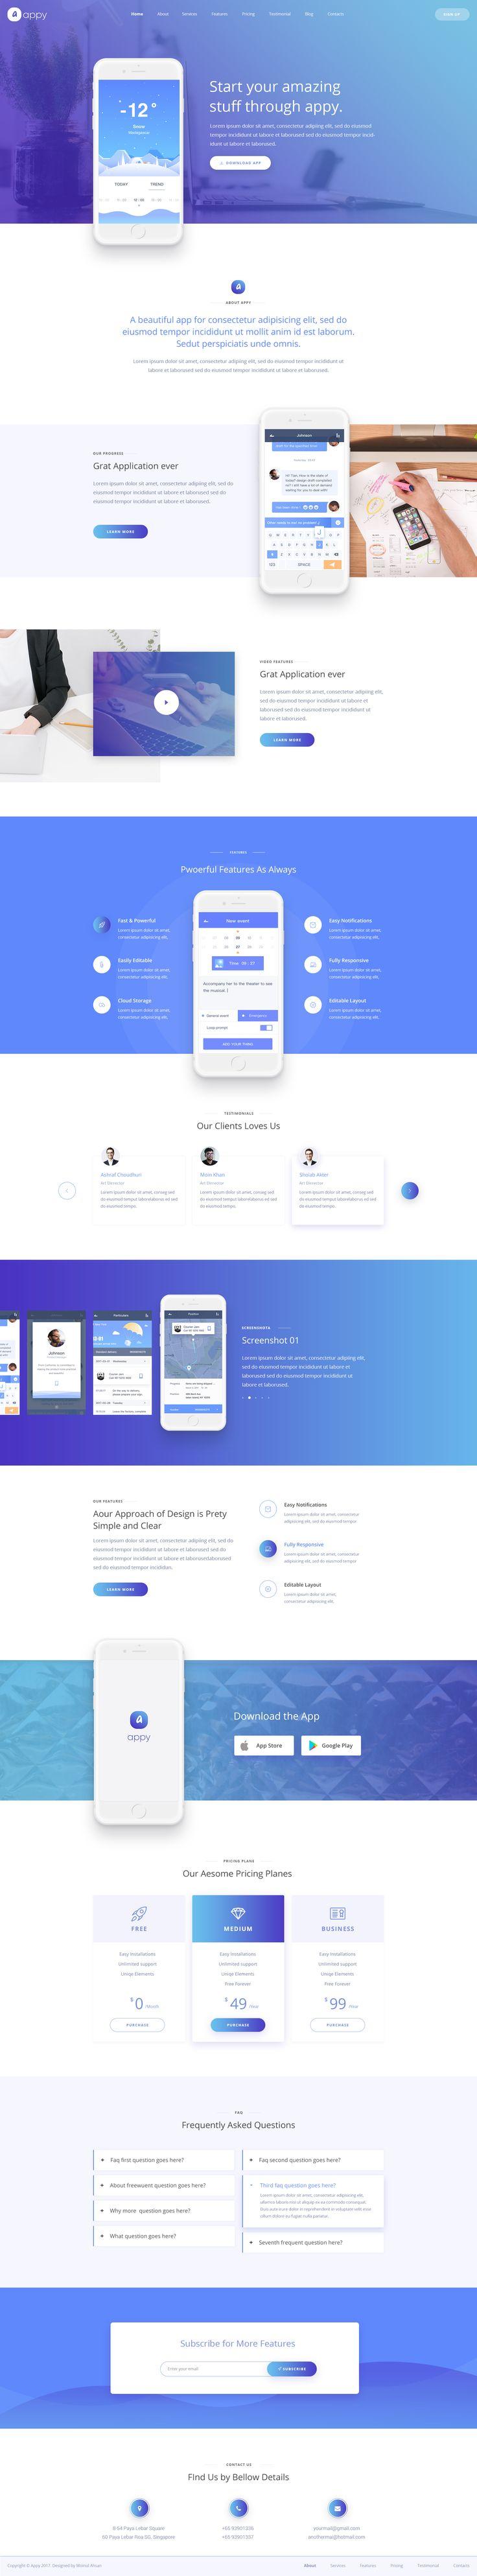 363 best Web Design images on Pinterest   Interface design, Web ...